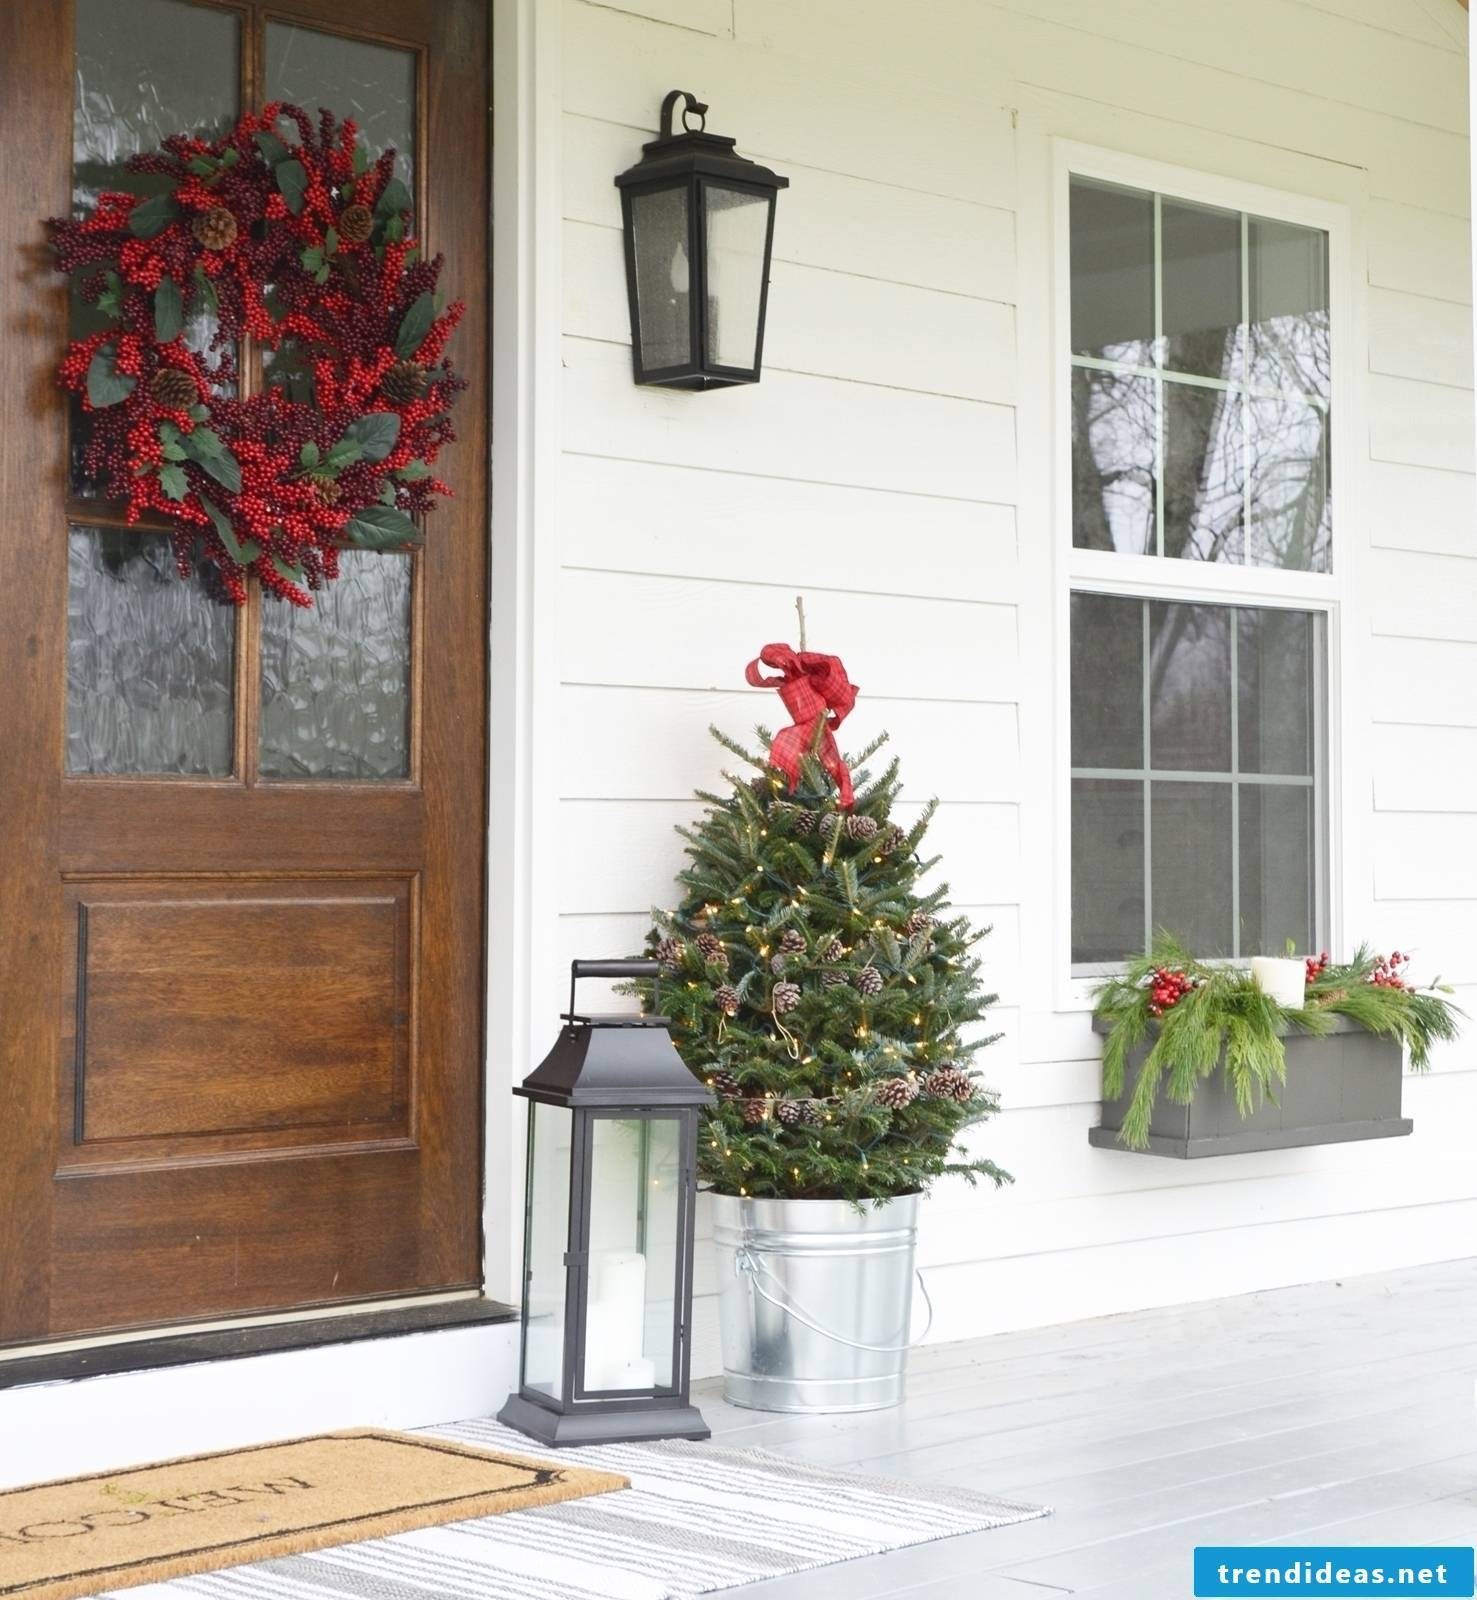 Beautiful Christmas house decoration for a good festive mood